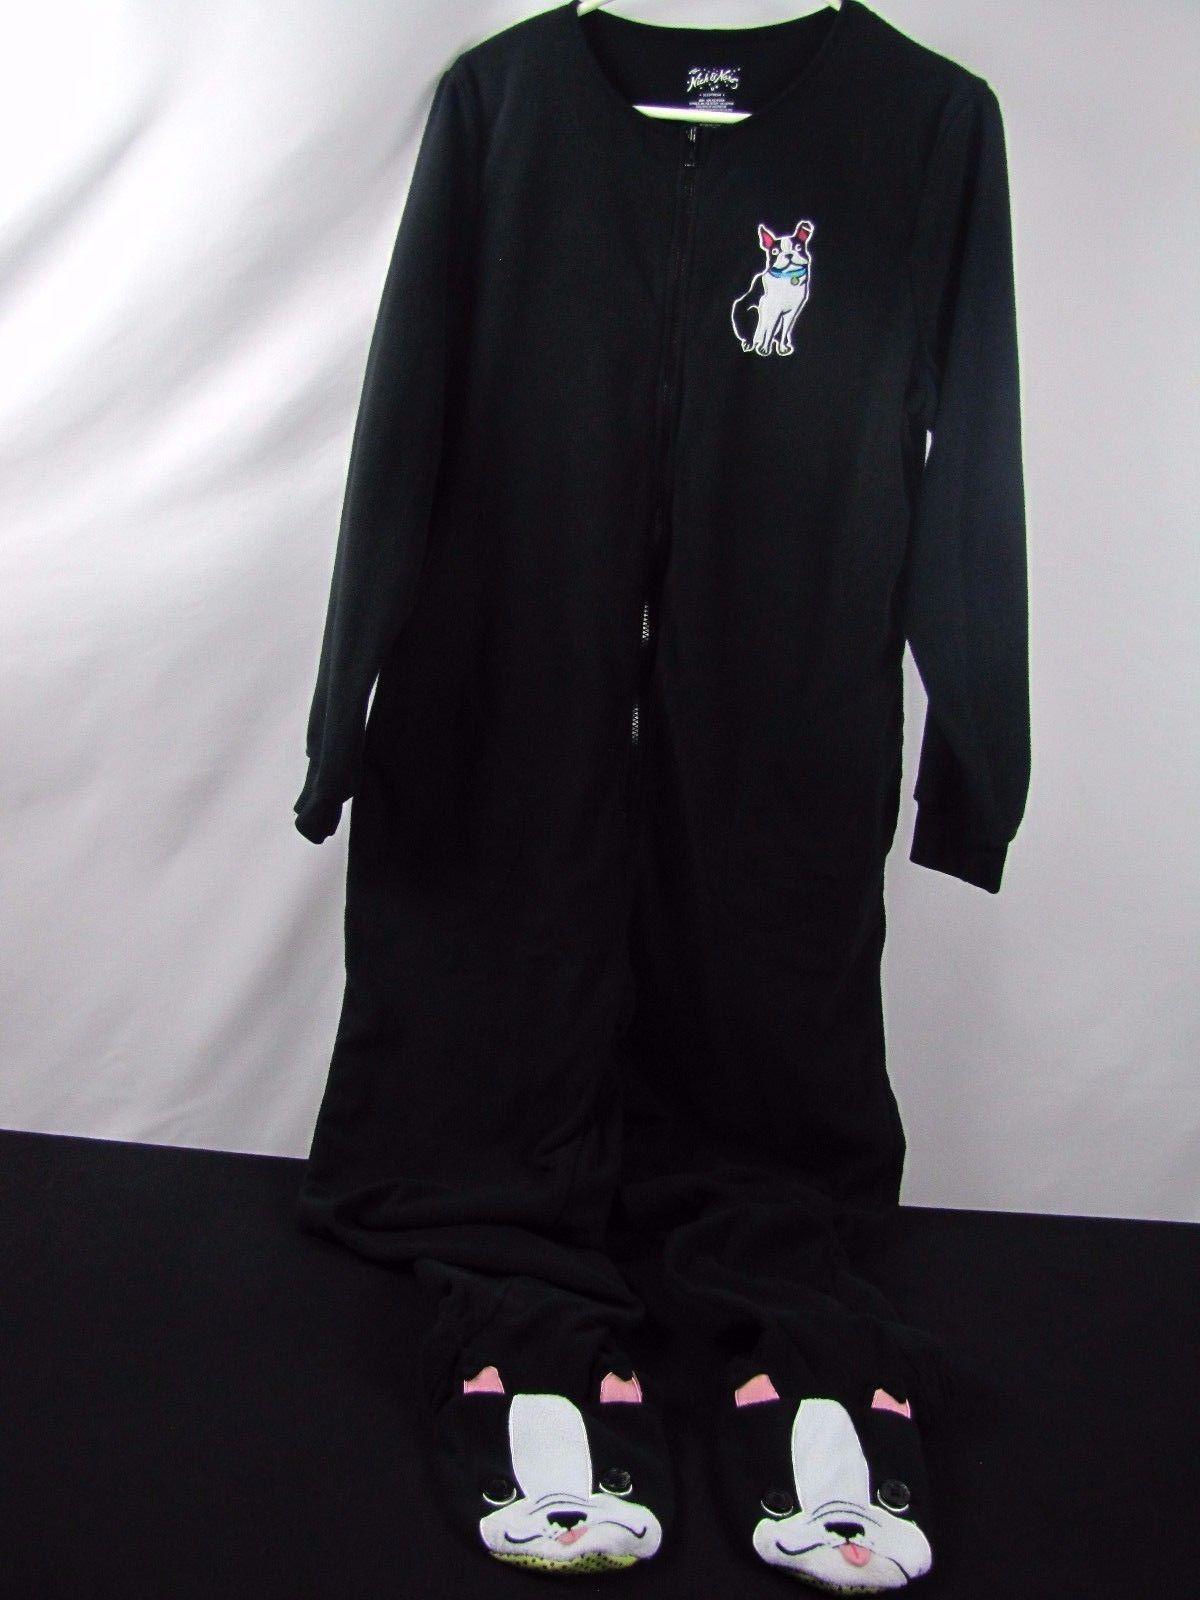 Nick and Nora Fleece Footed Pajamas Black White Boston Terrier Dog Size Medium